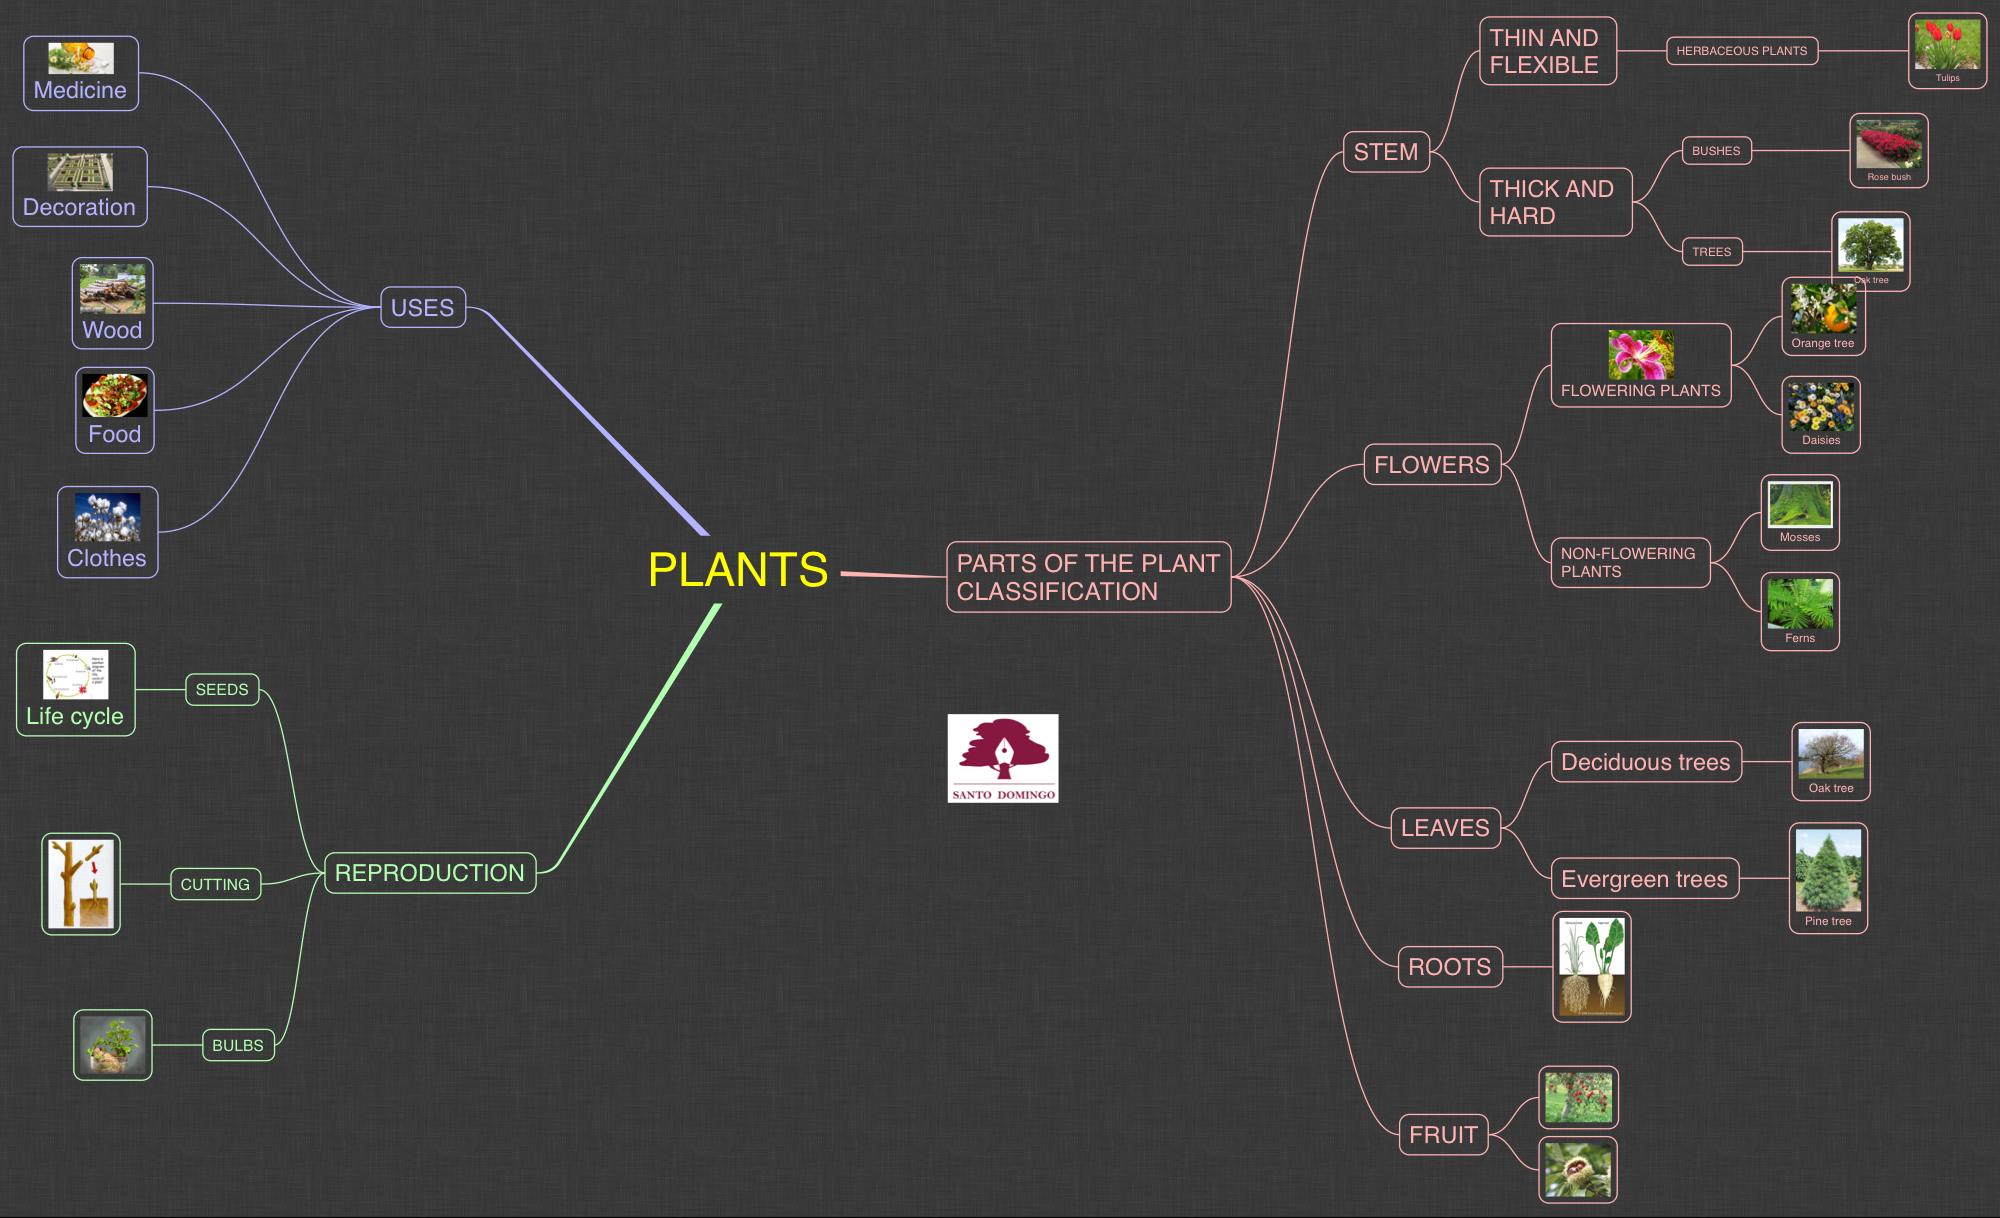 NS_PLANTS_2